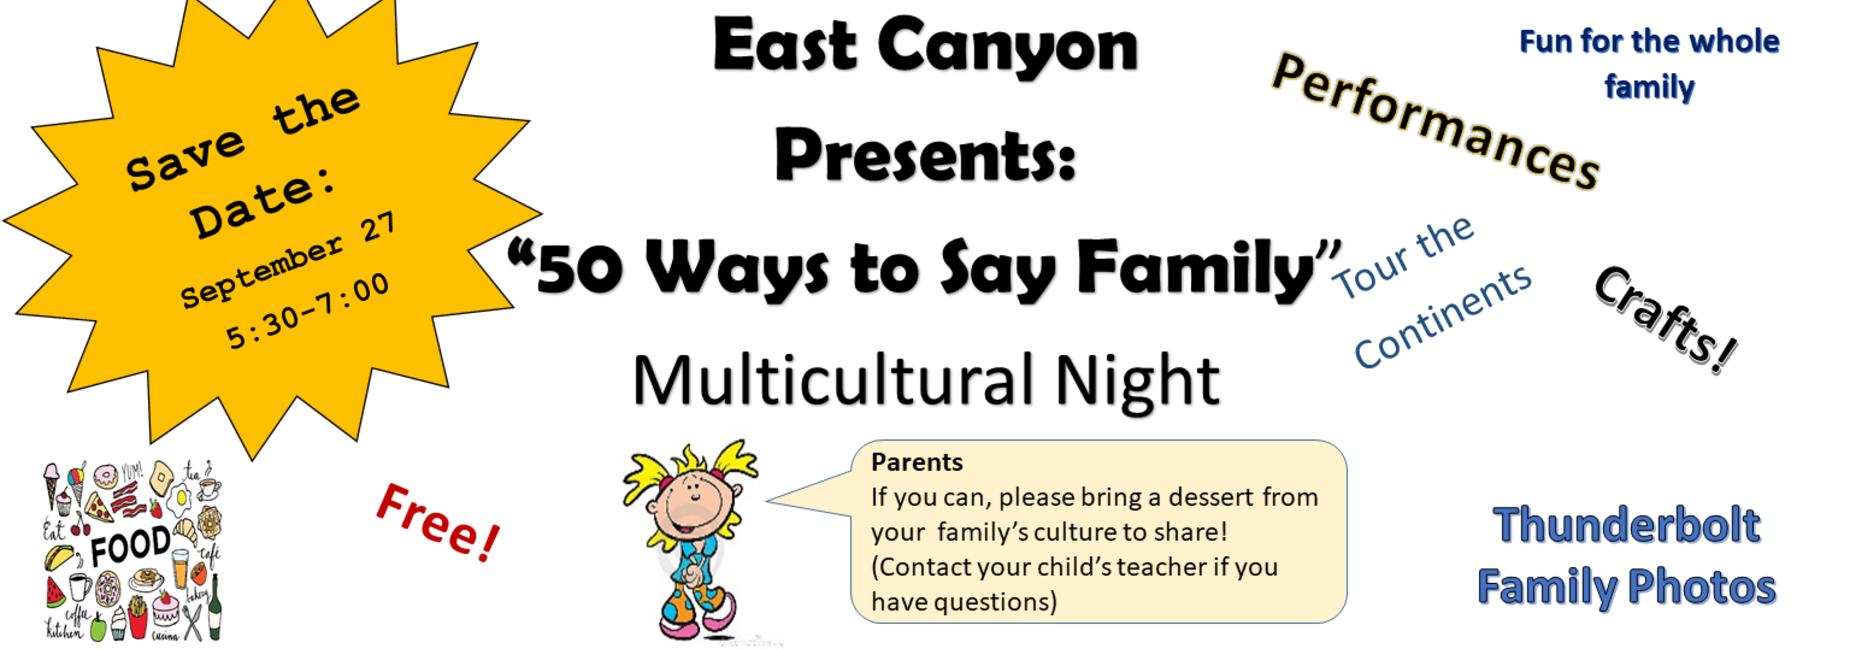 Multicultural Night